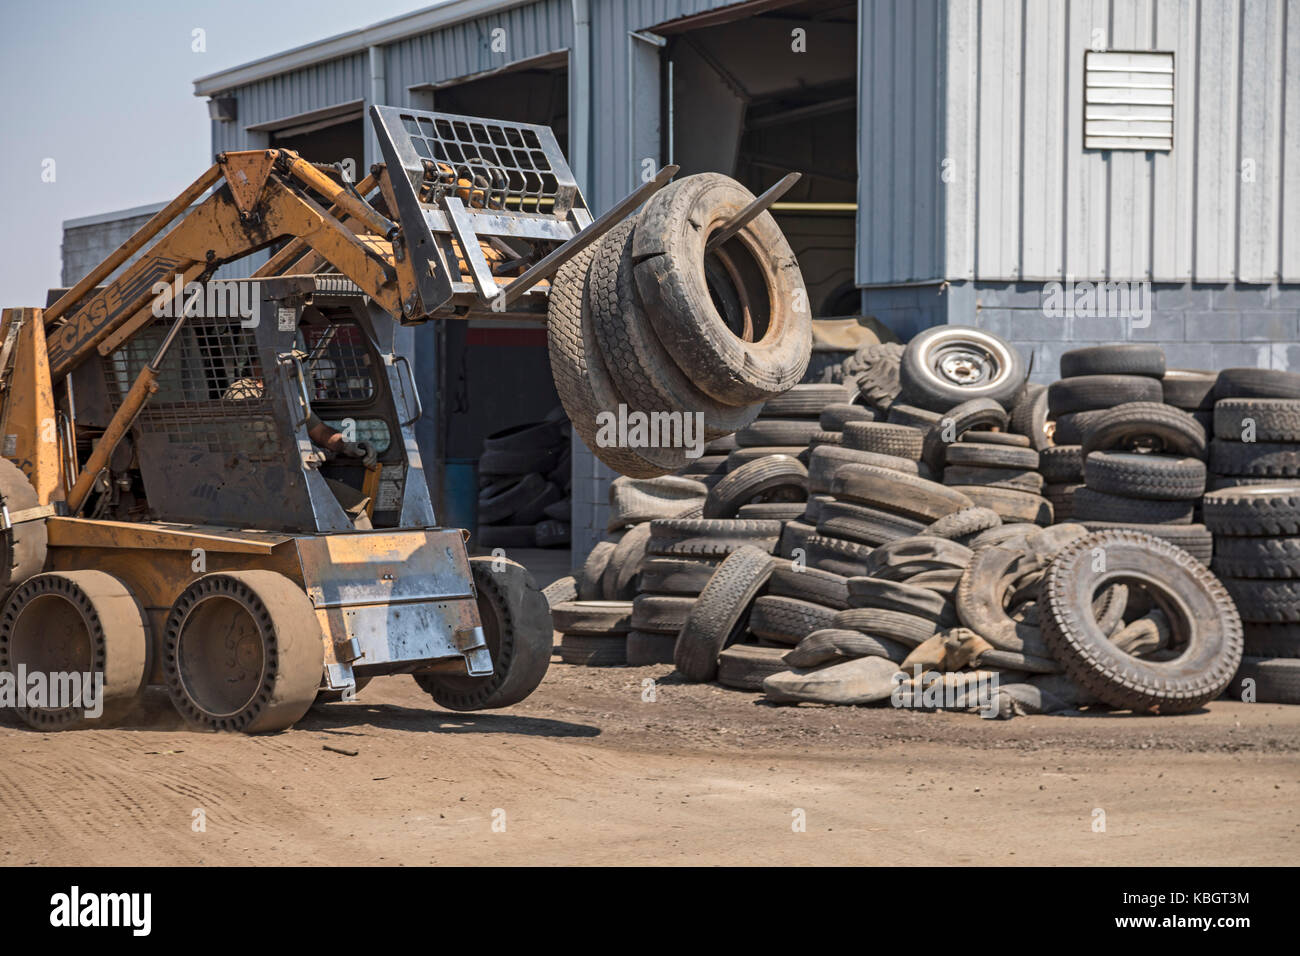 Denver Colorado Used Tires At Colorado Tire Recycling Stock Photo